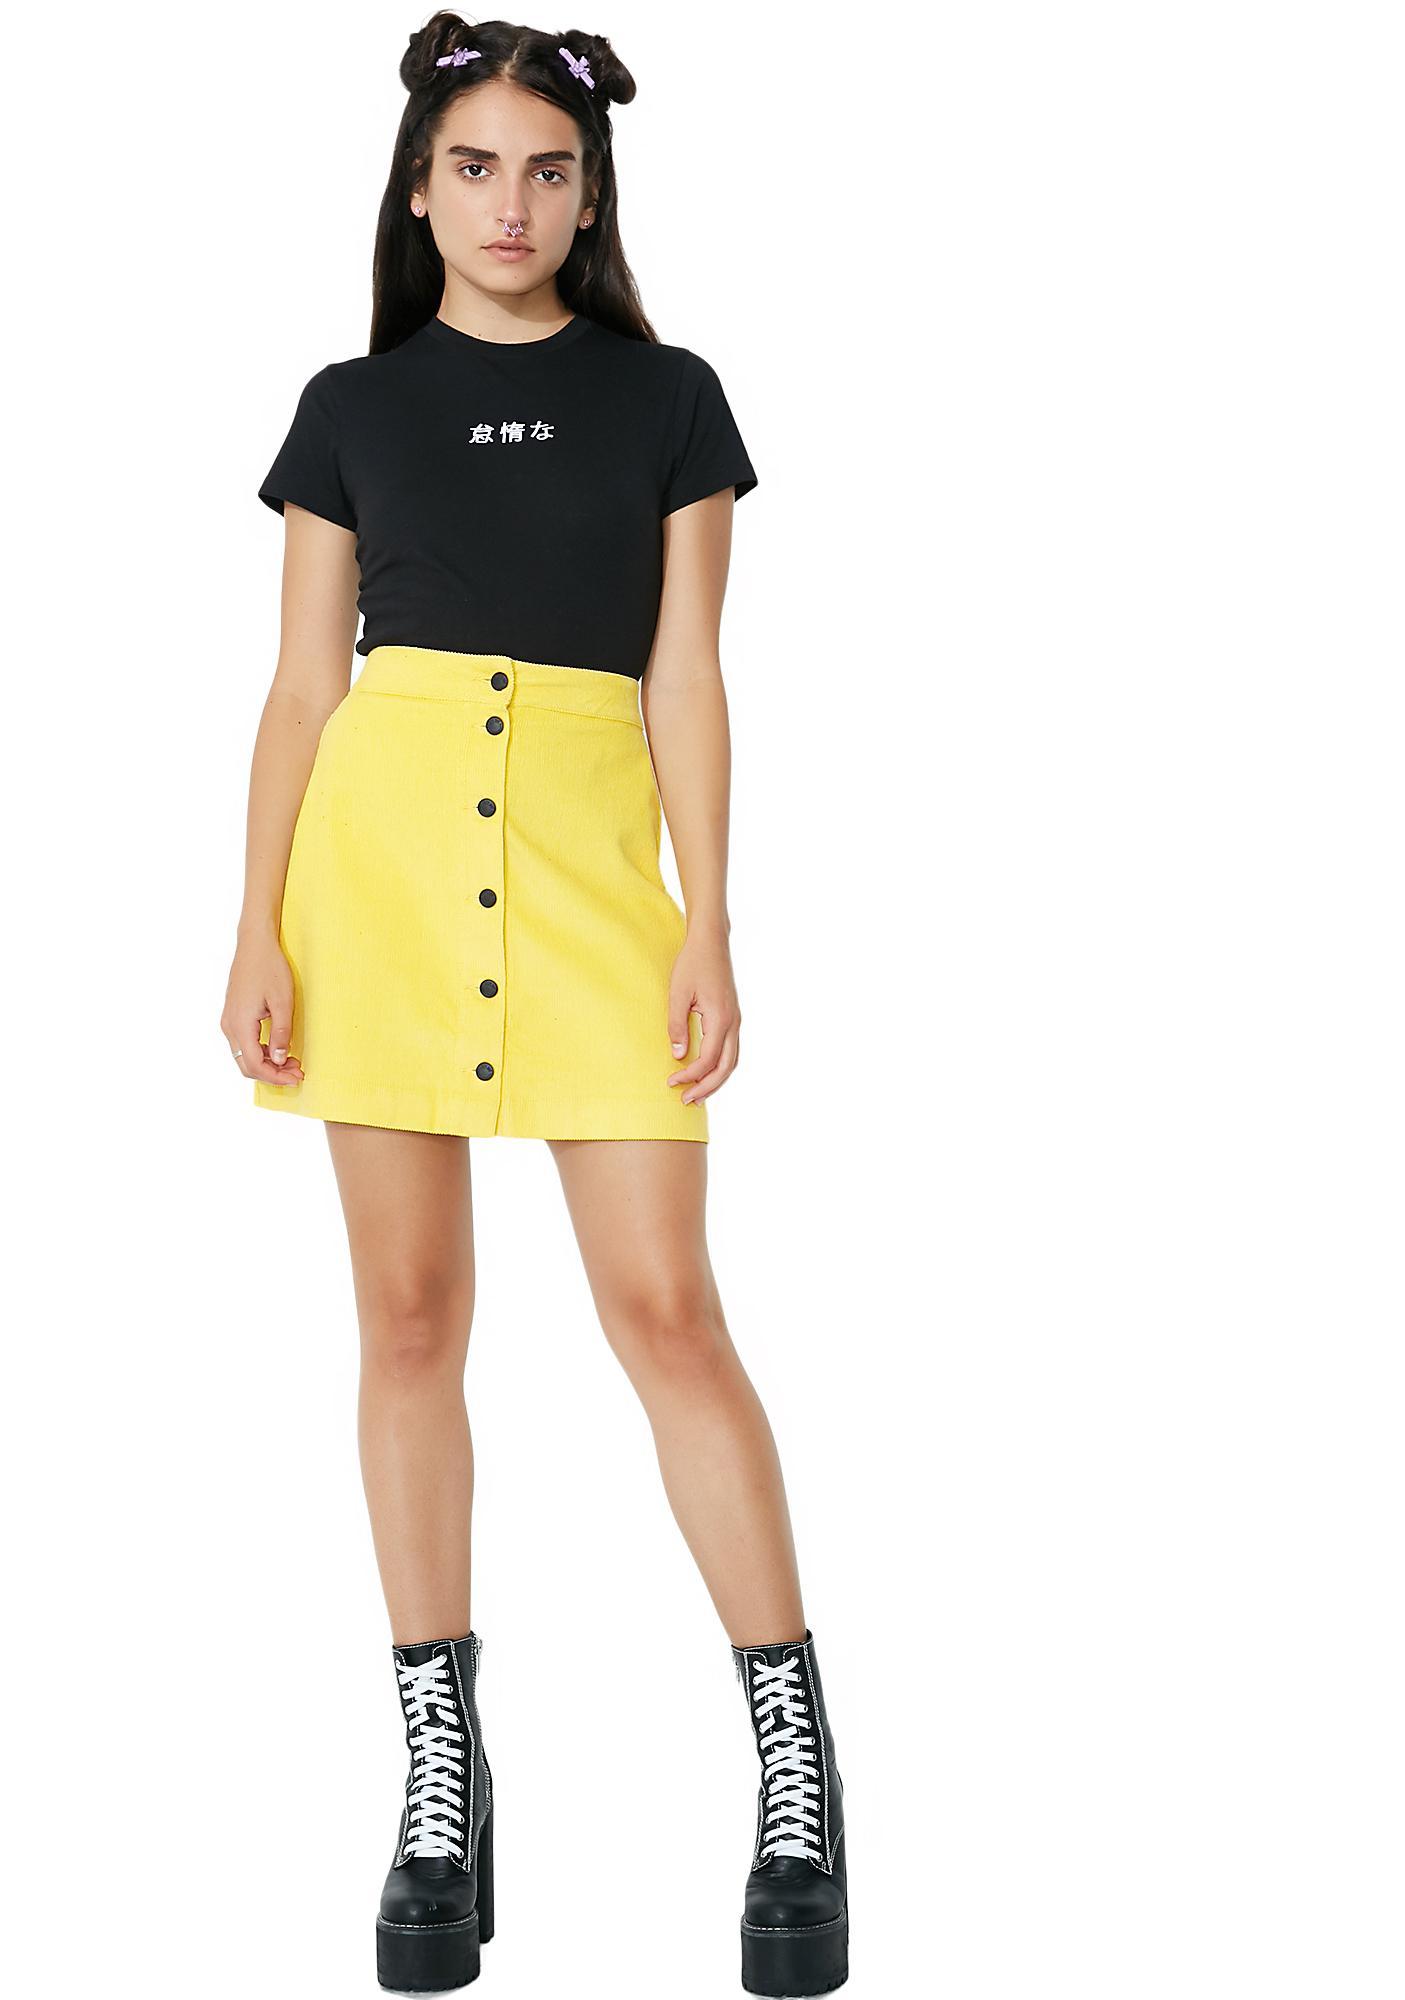 Lazy Oaf Moody Mustard Skirt